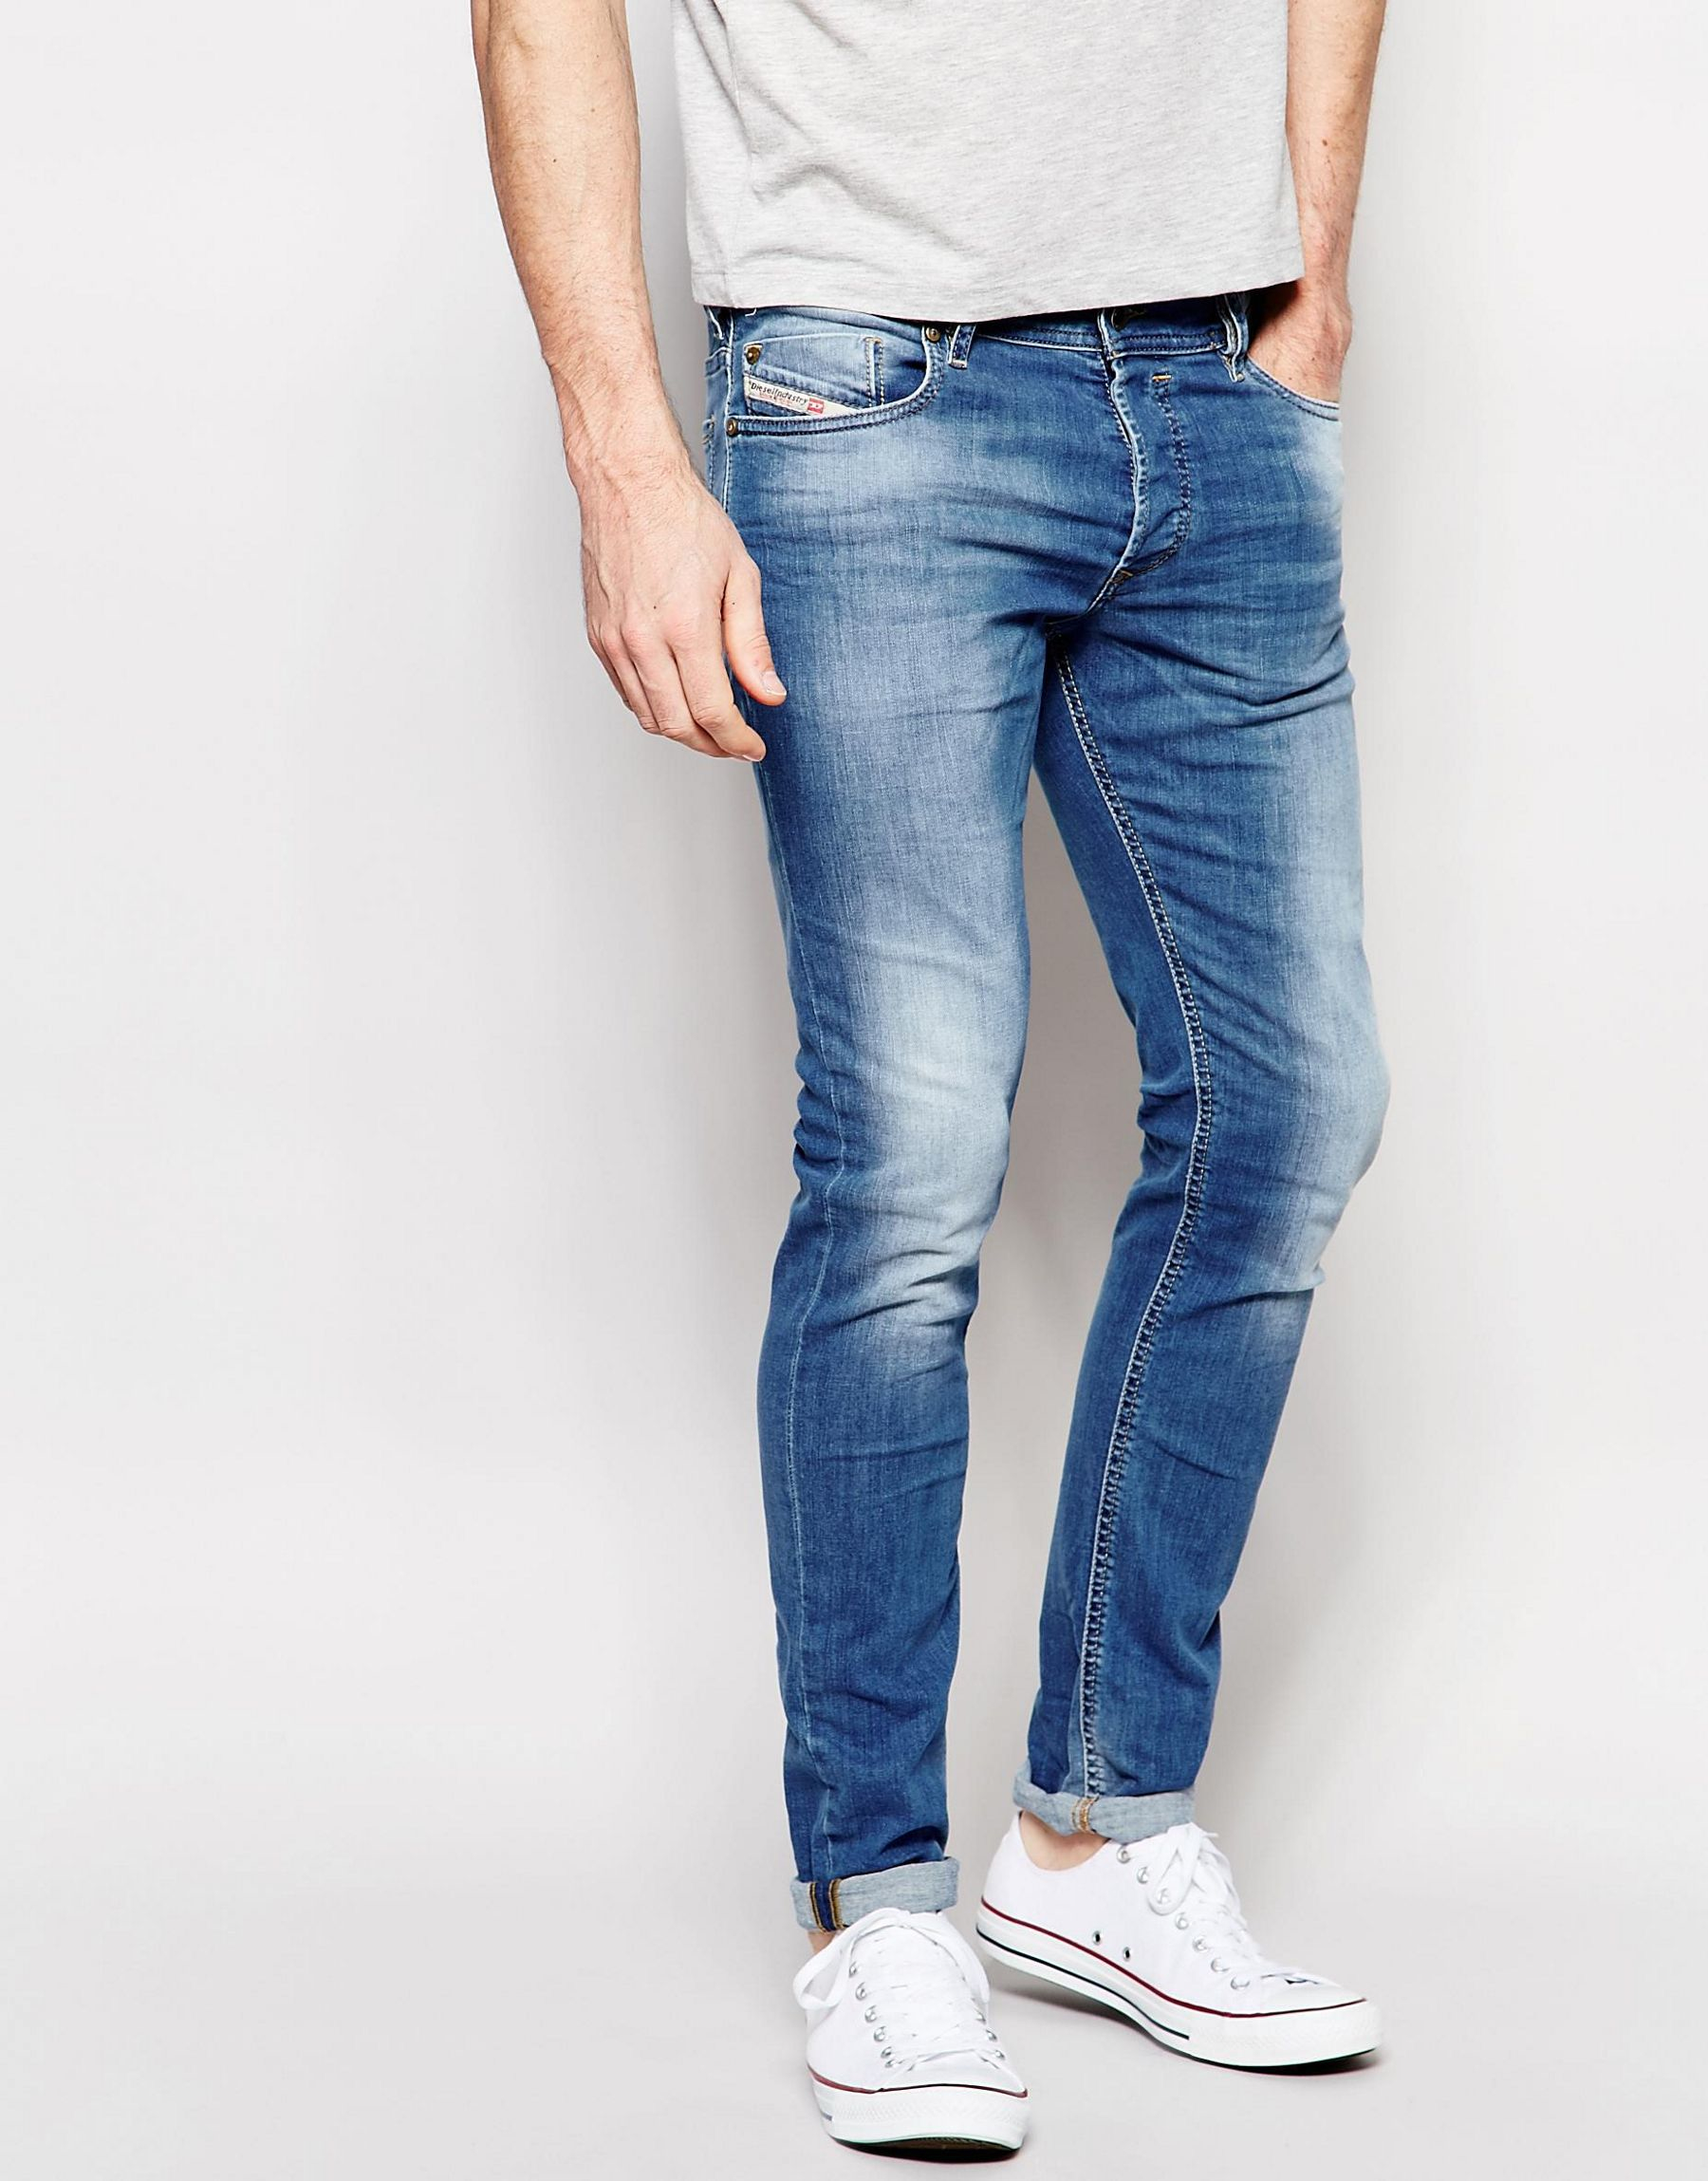 7acb2f49 DIESEL Jeans Sleenker 607k Skinny Fit Stretch Light Distressed Wash ...